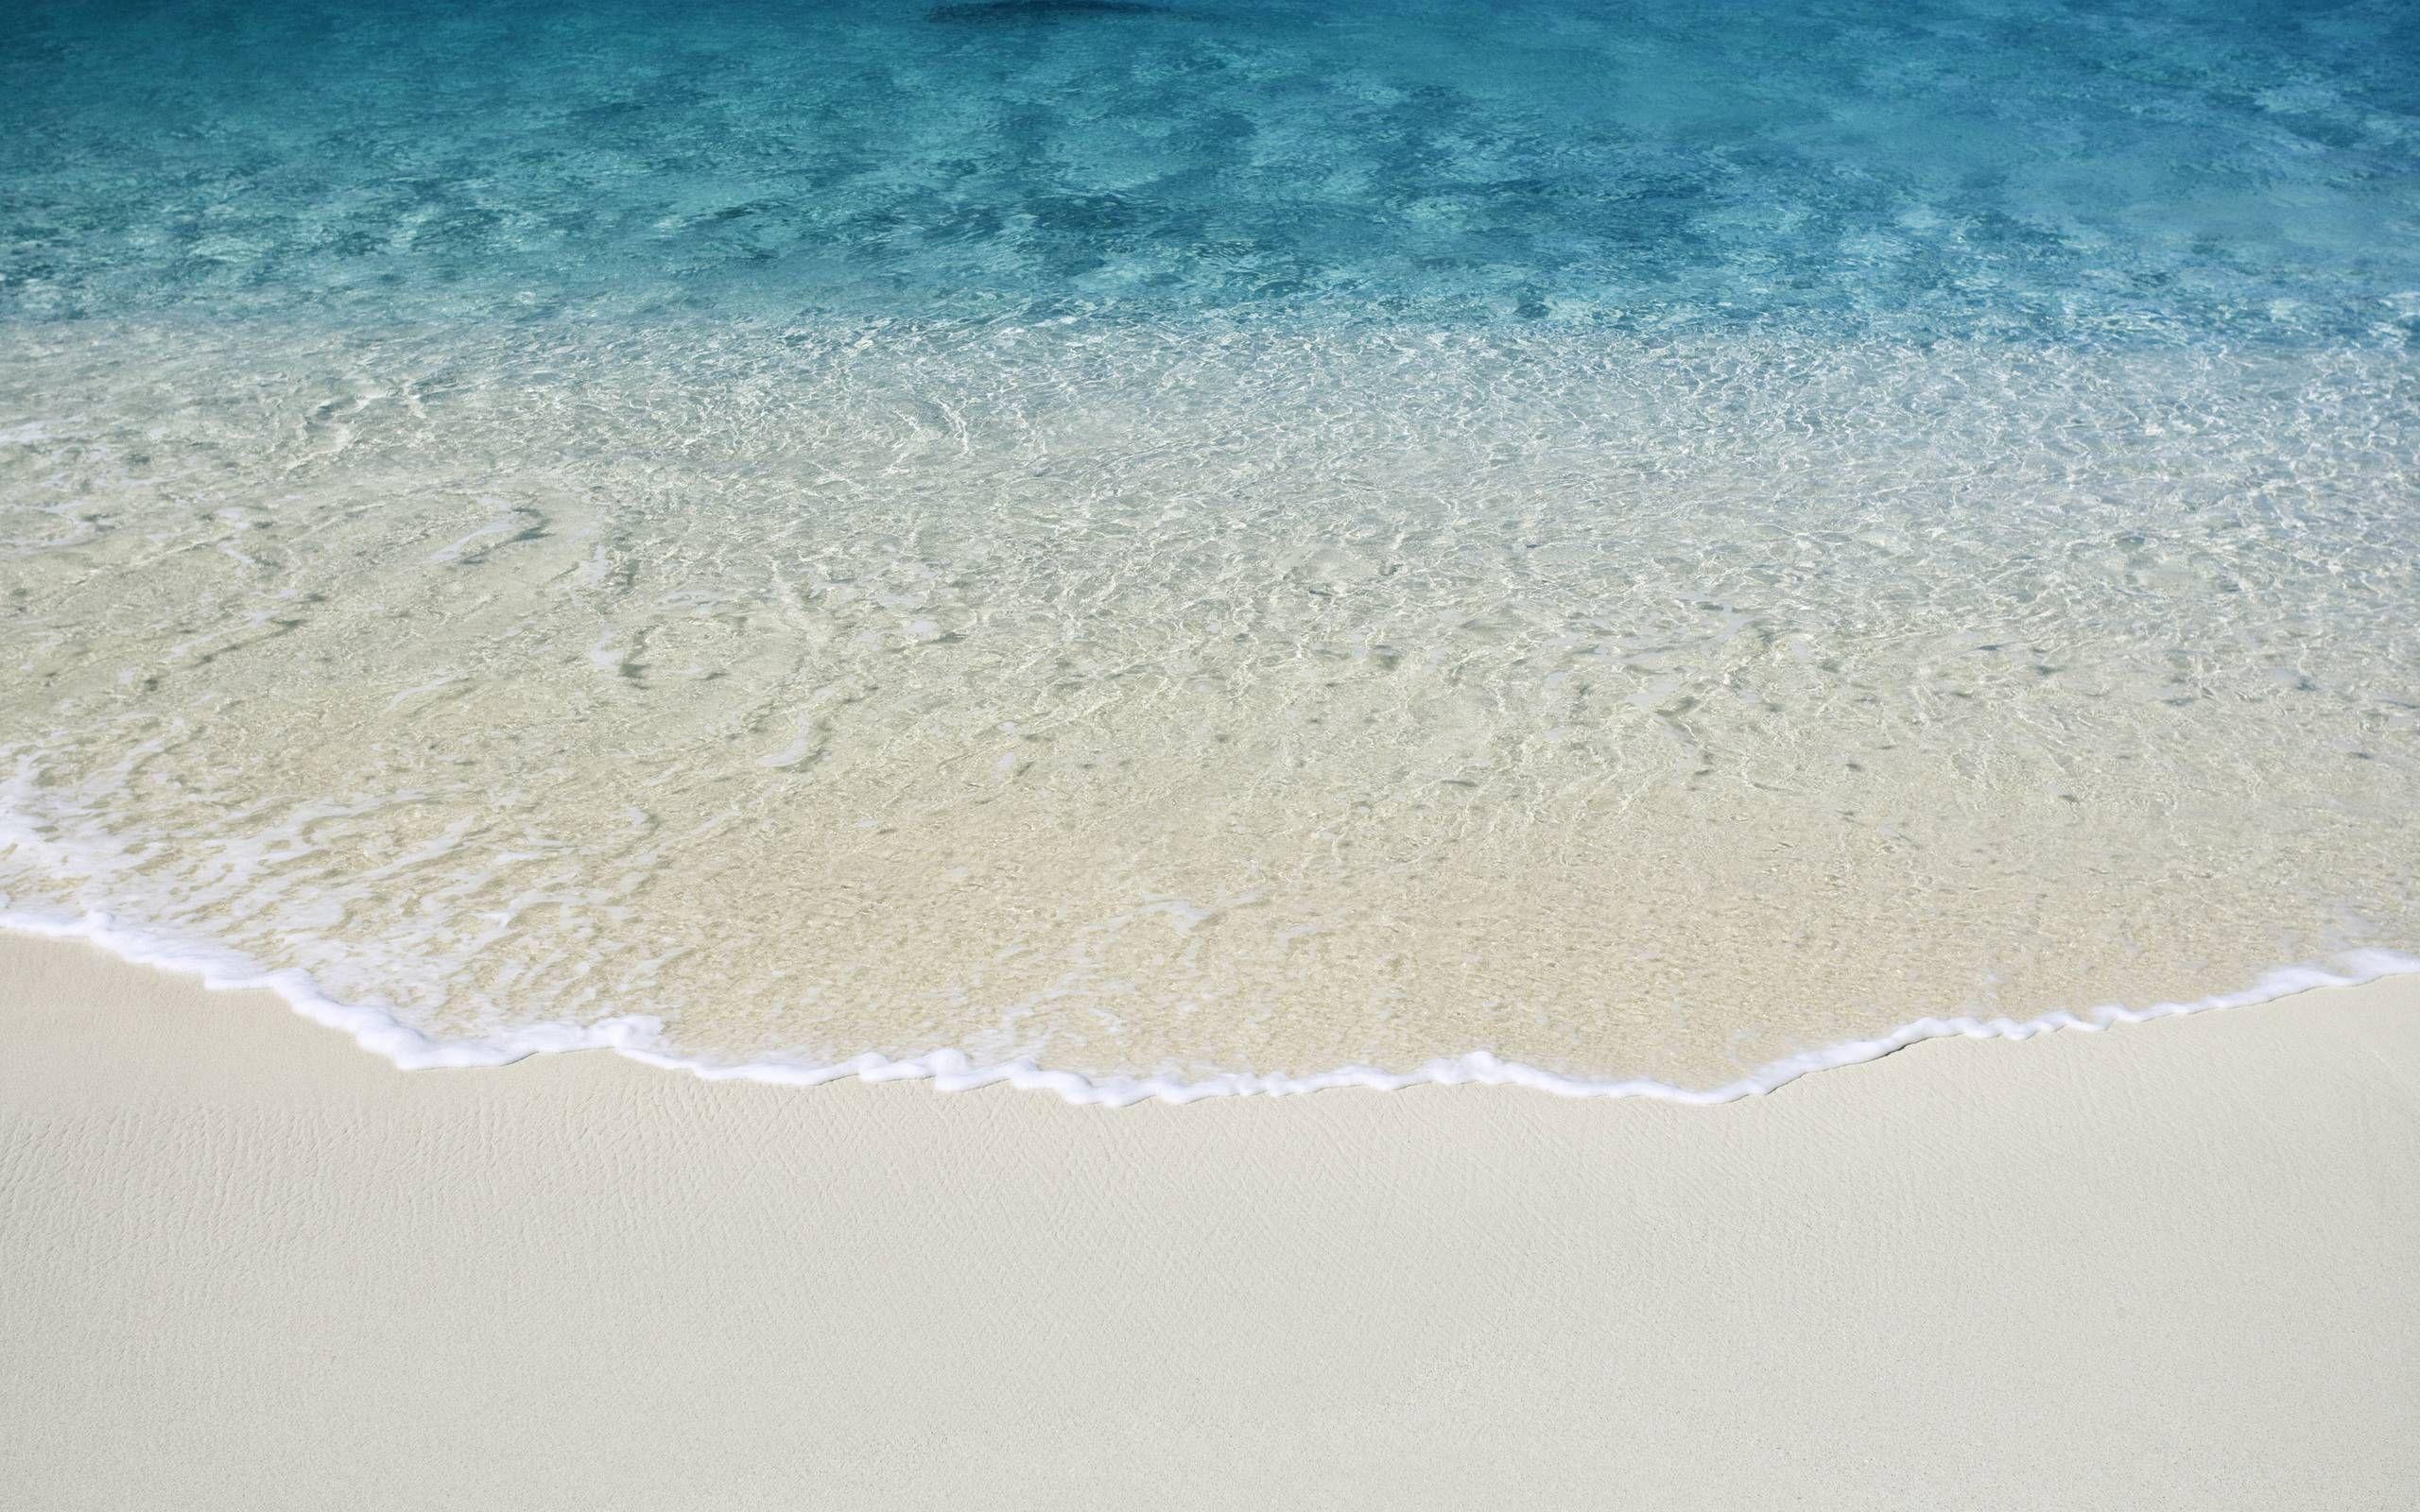 Summer Sand Wallpapers Summer Sand Stock Photos